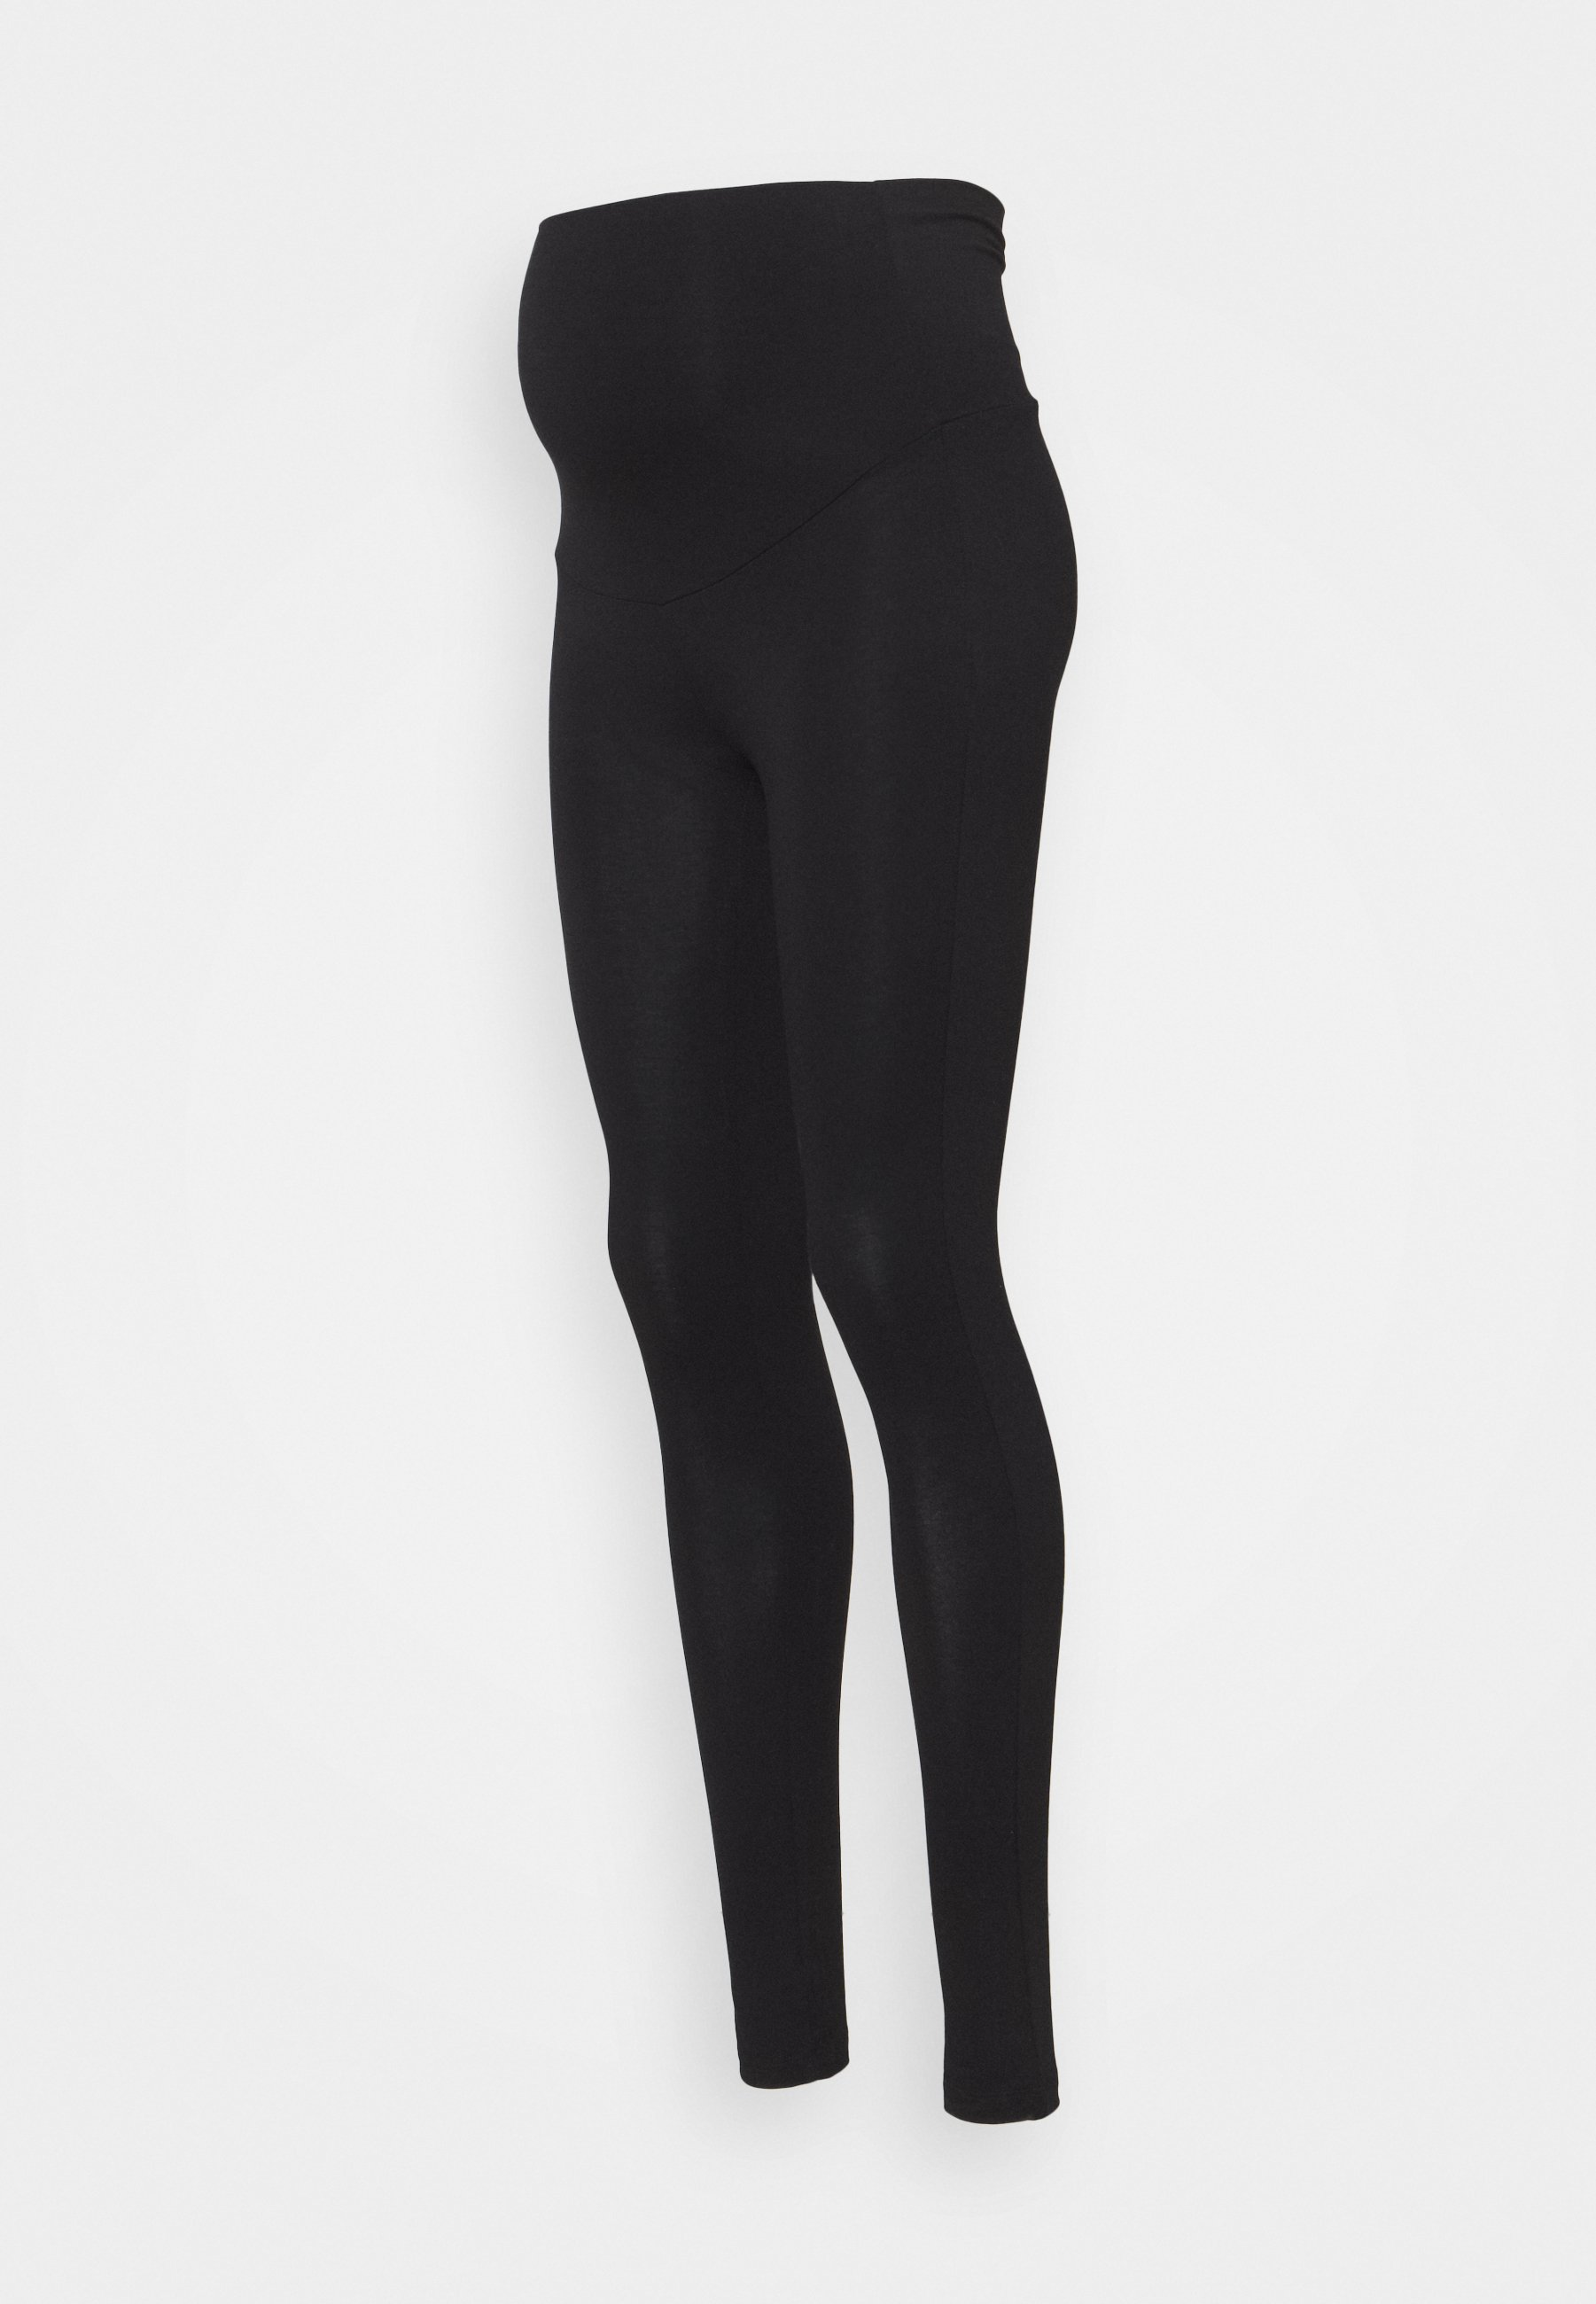 Damen PARIS - Leggings - Hosen